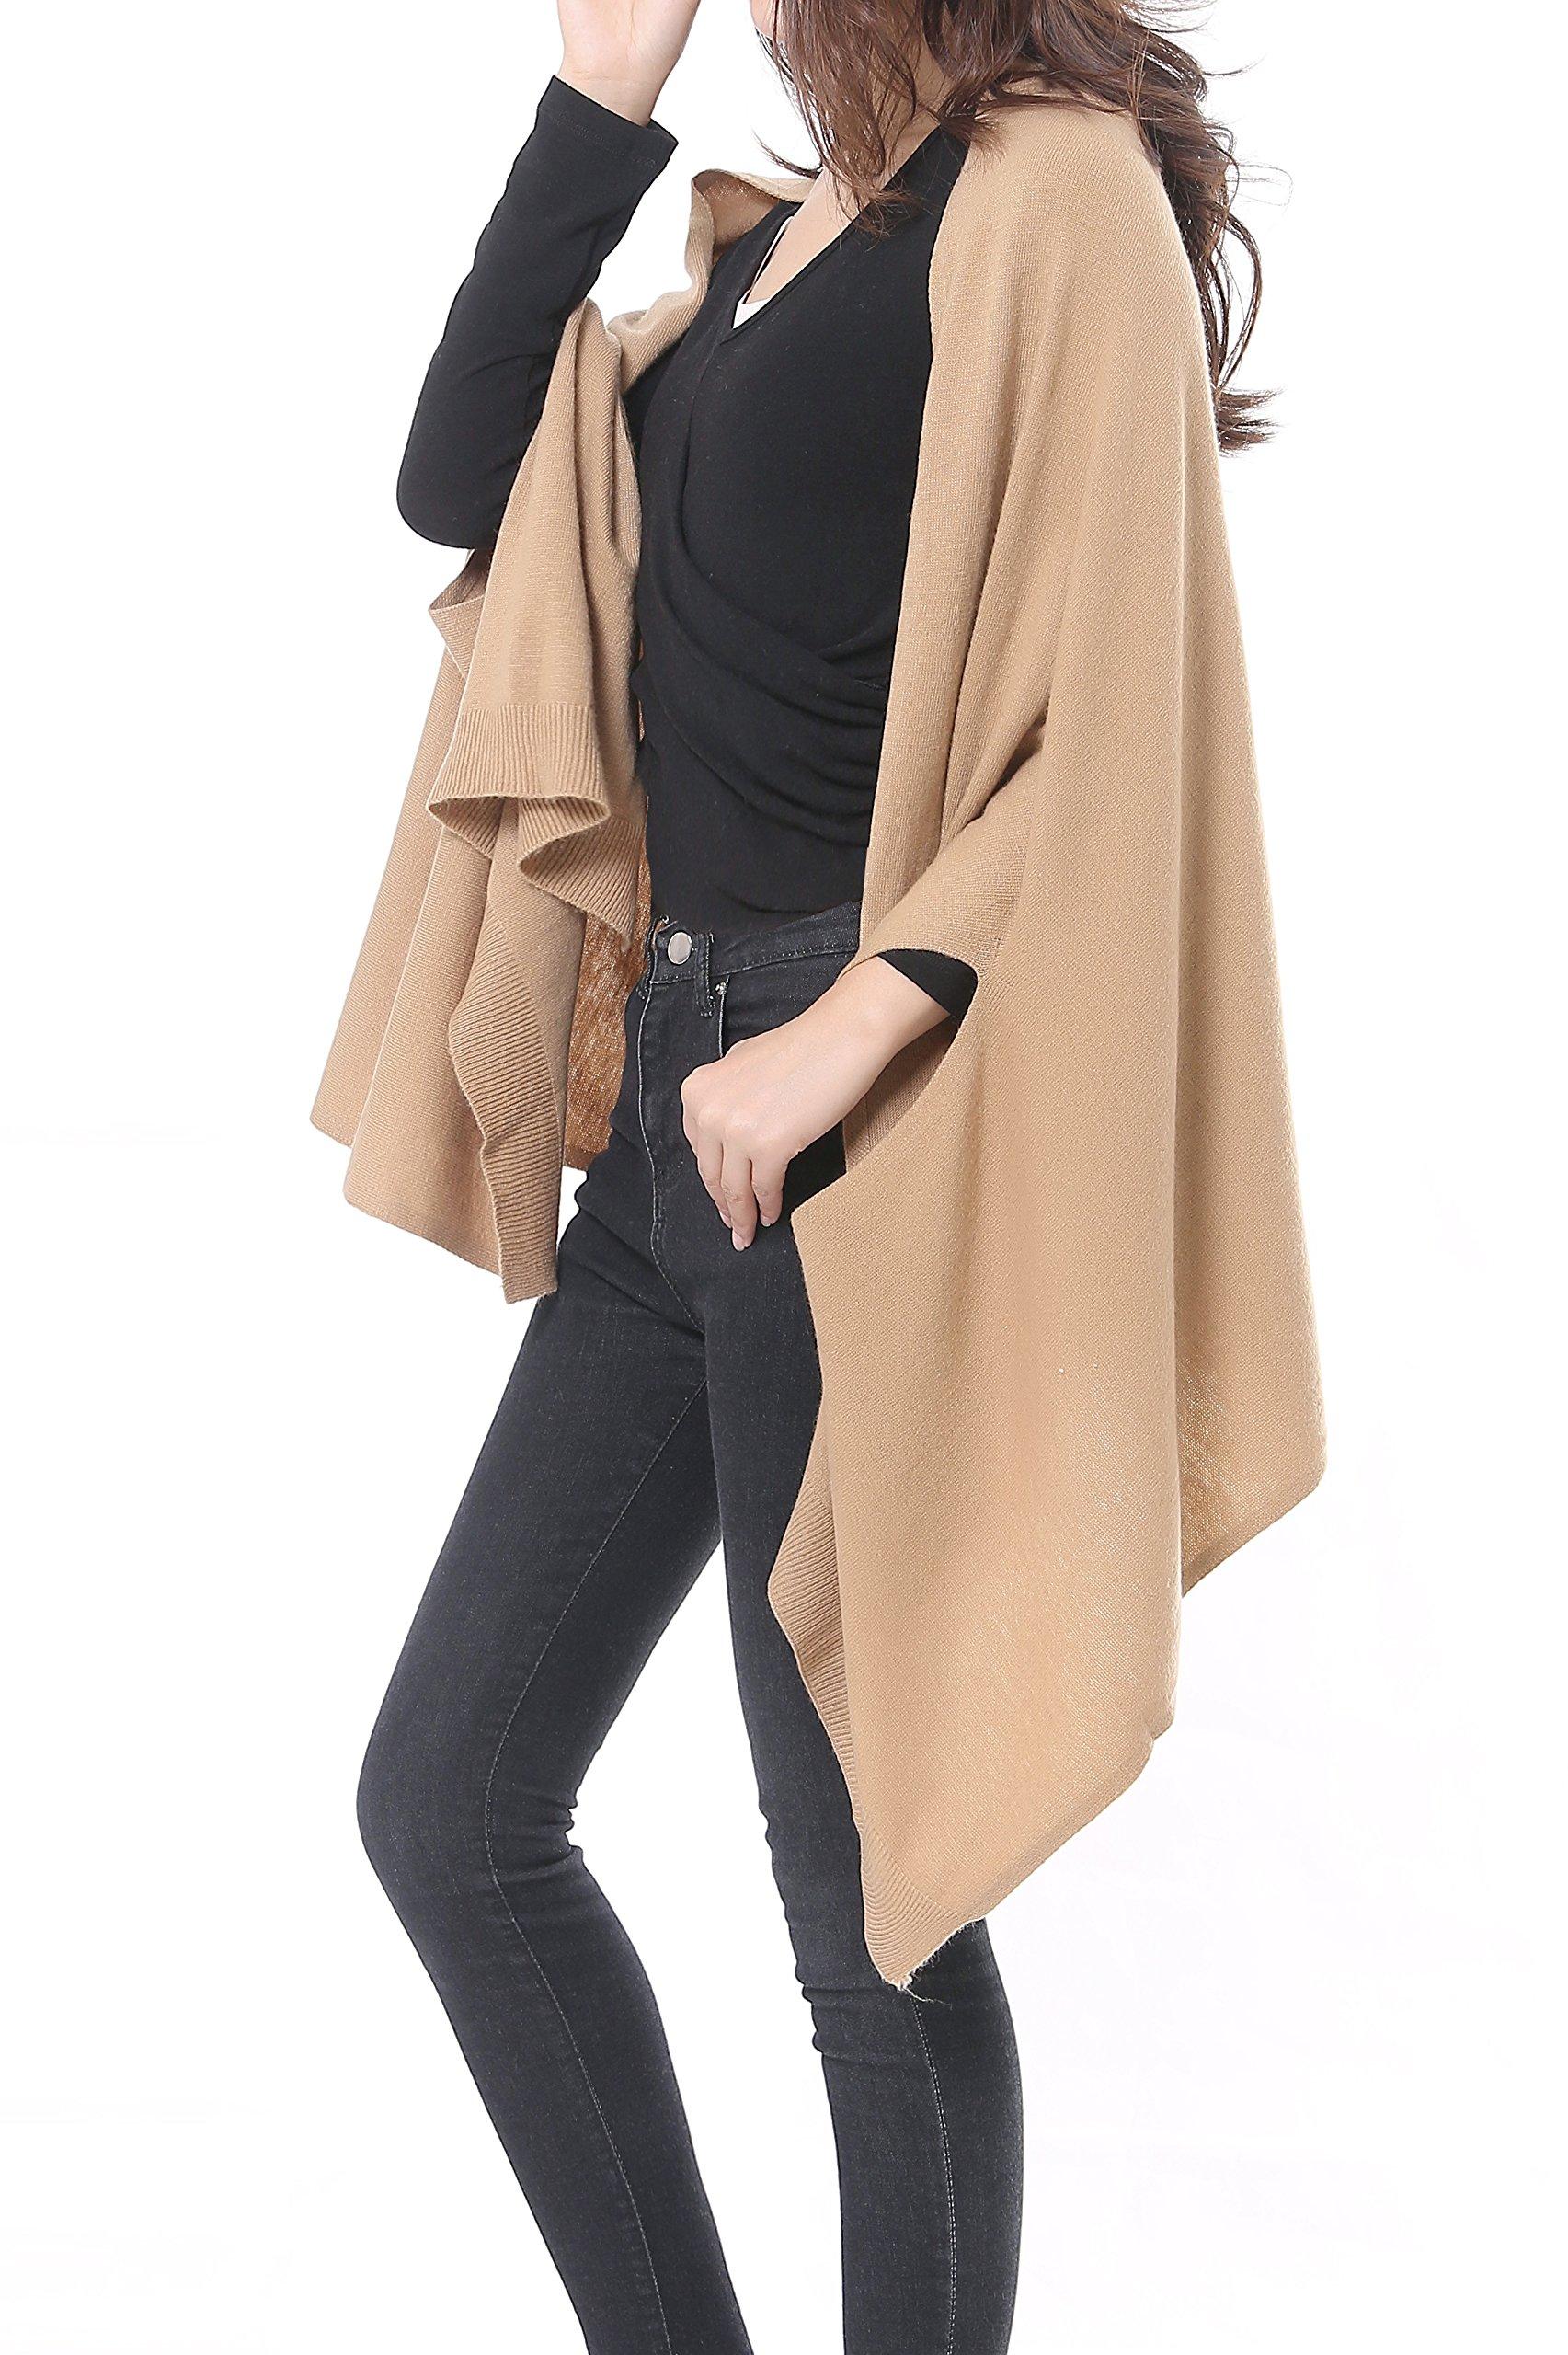 Bruceriver Women's Wool Blended Versatile Multi Style Long Knit Scarf Size M/L (Camel)